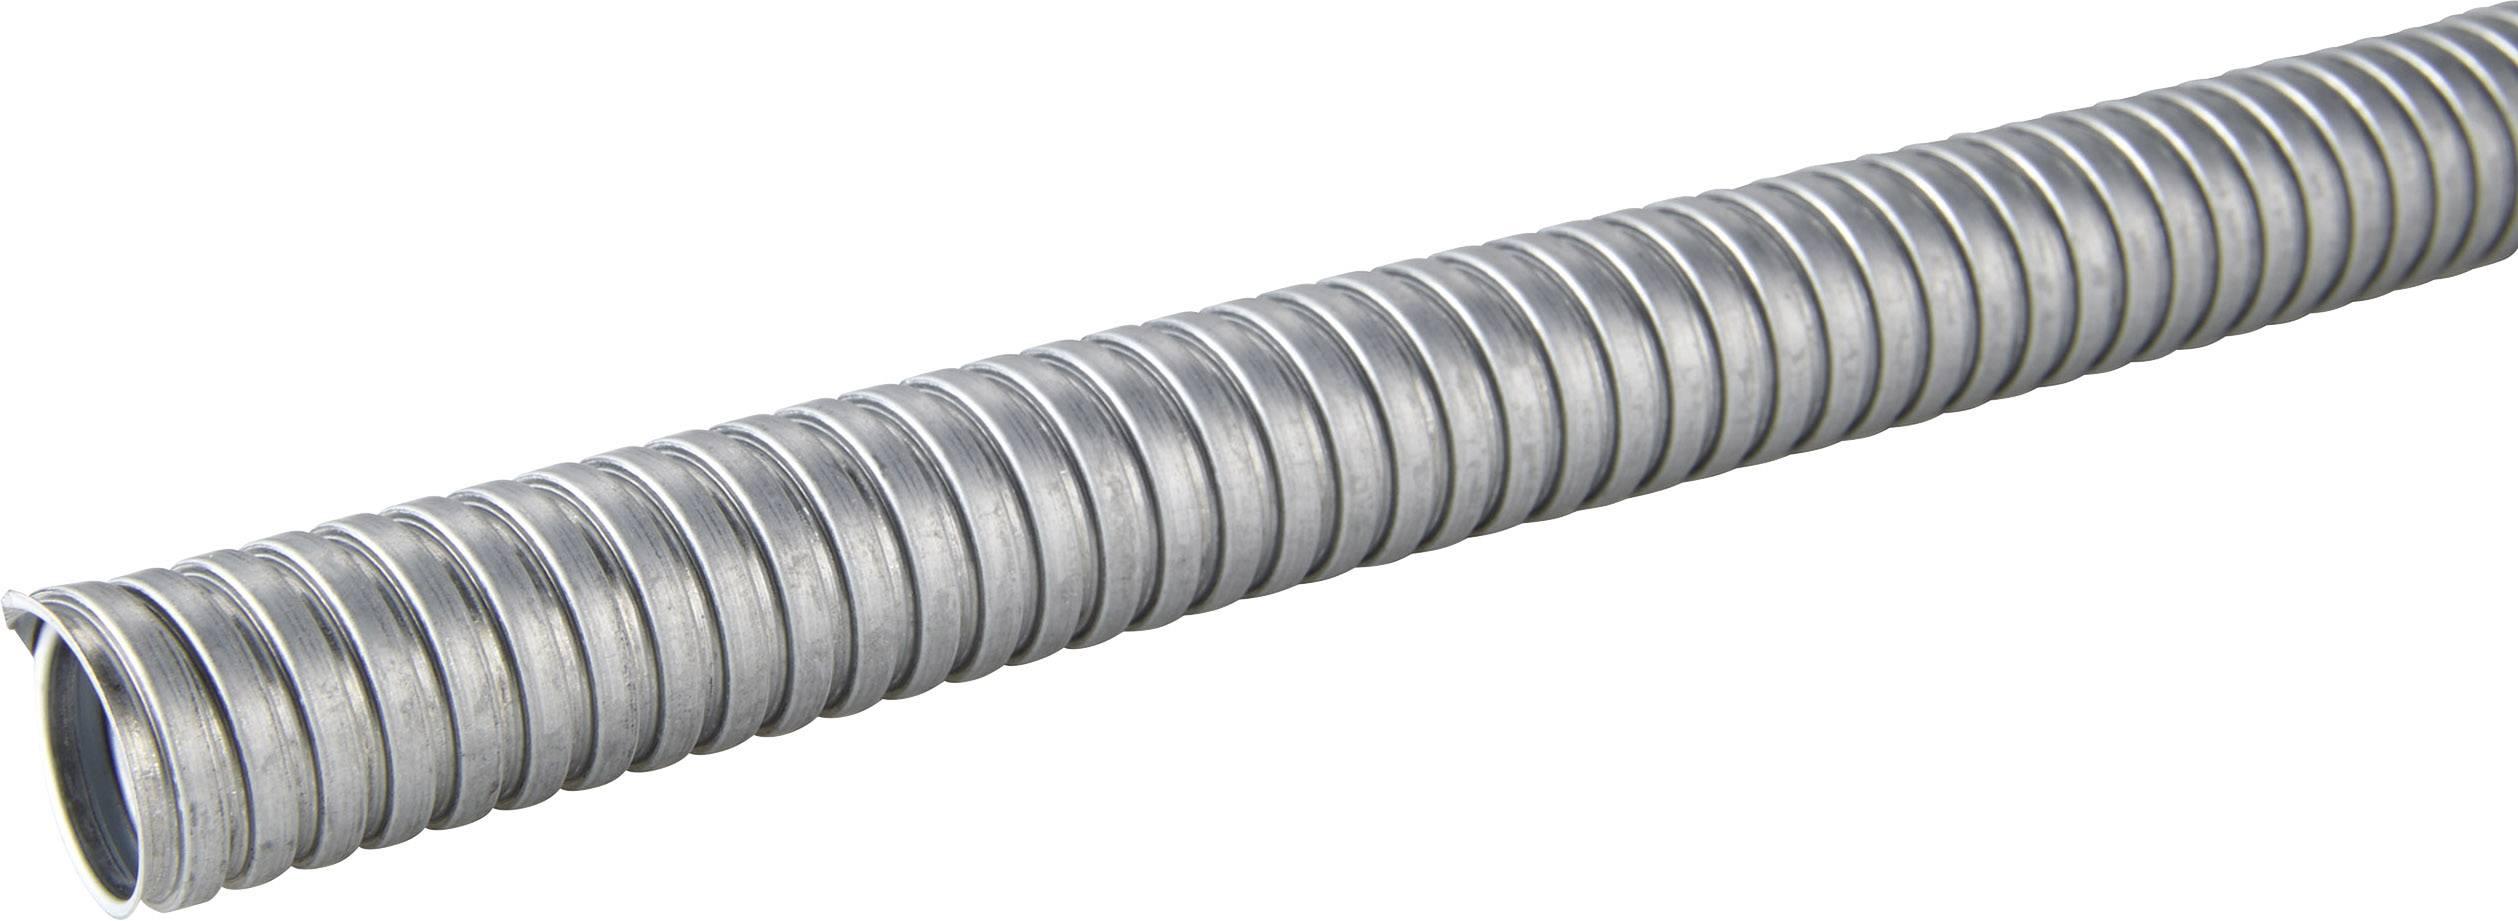 Ochranná hadice na kov LAPP SILVYN® AS 13,5/16x19 61802110, stříbrná, 50 m